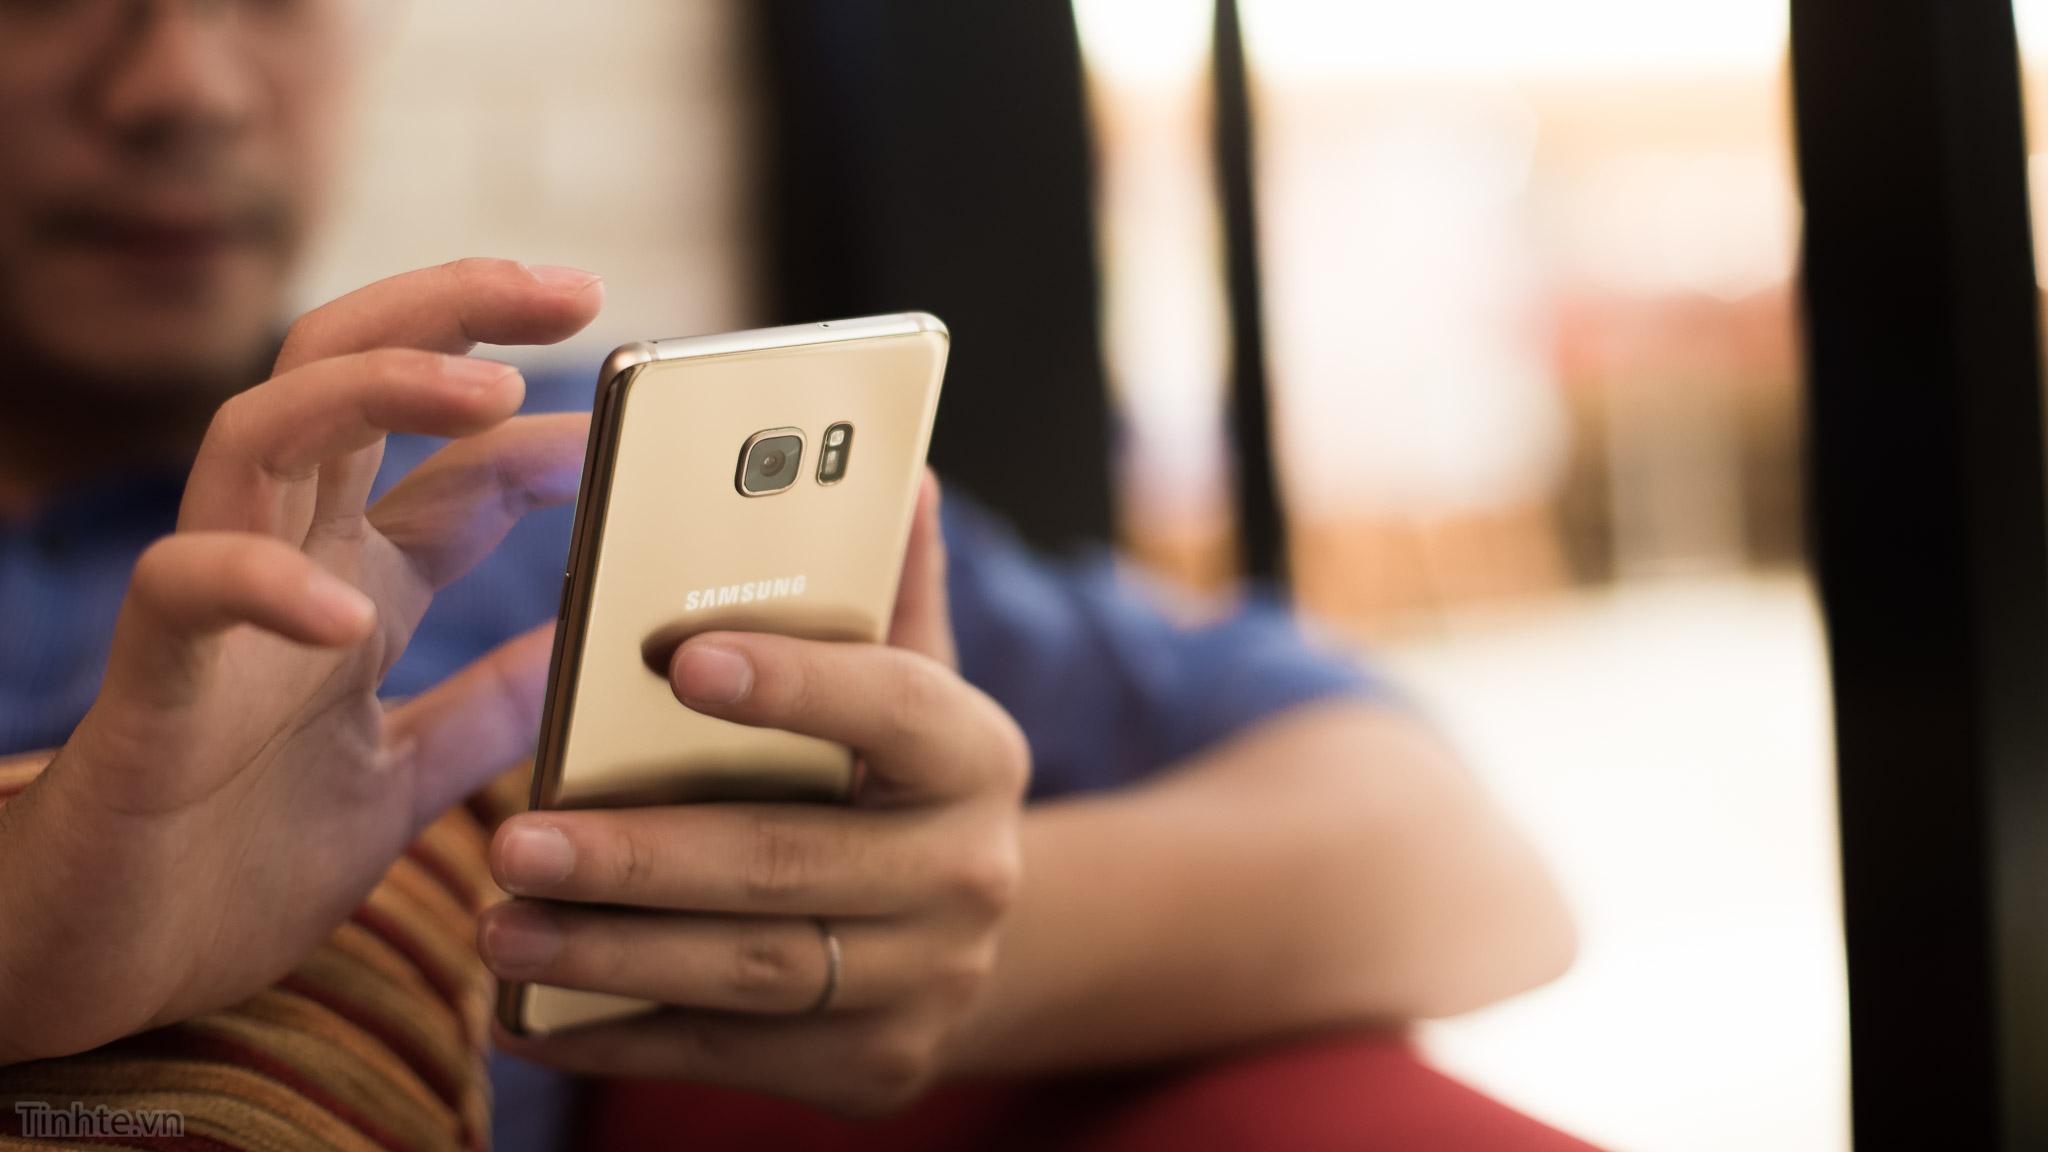 Samsung_Galaxy_Note_7_review_tinhte.vn.jpg